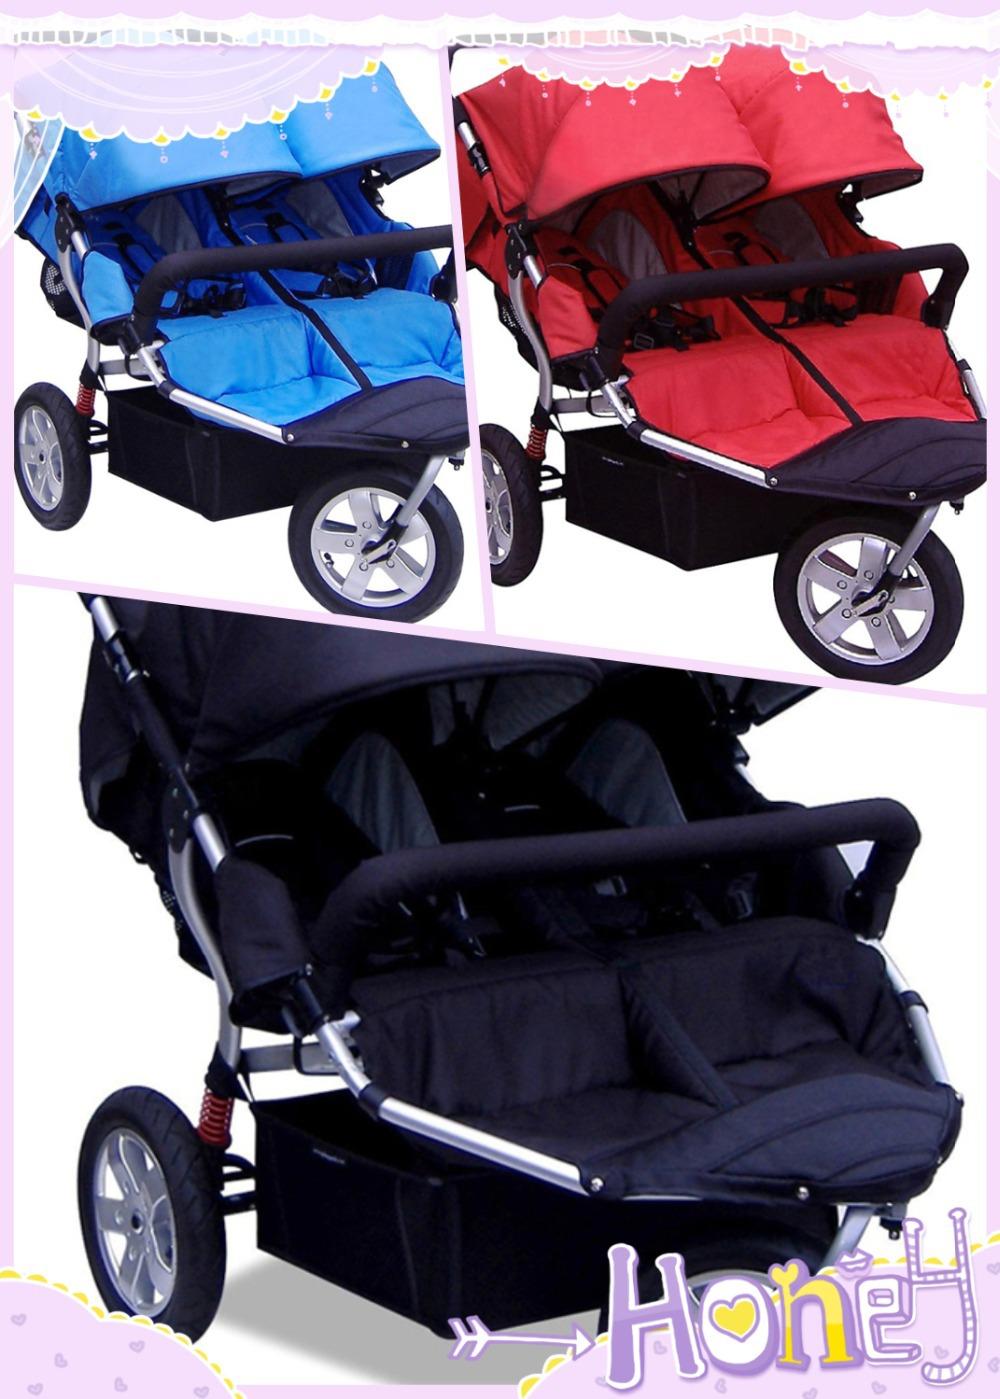 Rotating wheel orientable a double foot brake rear wheels Stroller Twins Car Seat<br><br>Aliexpress